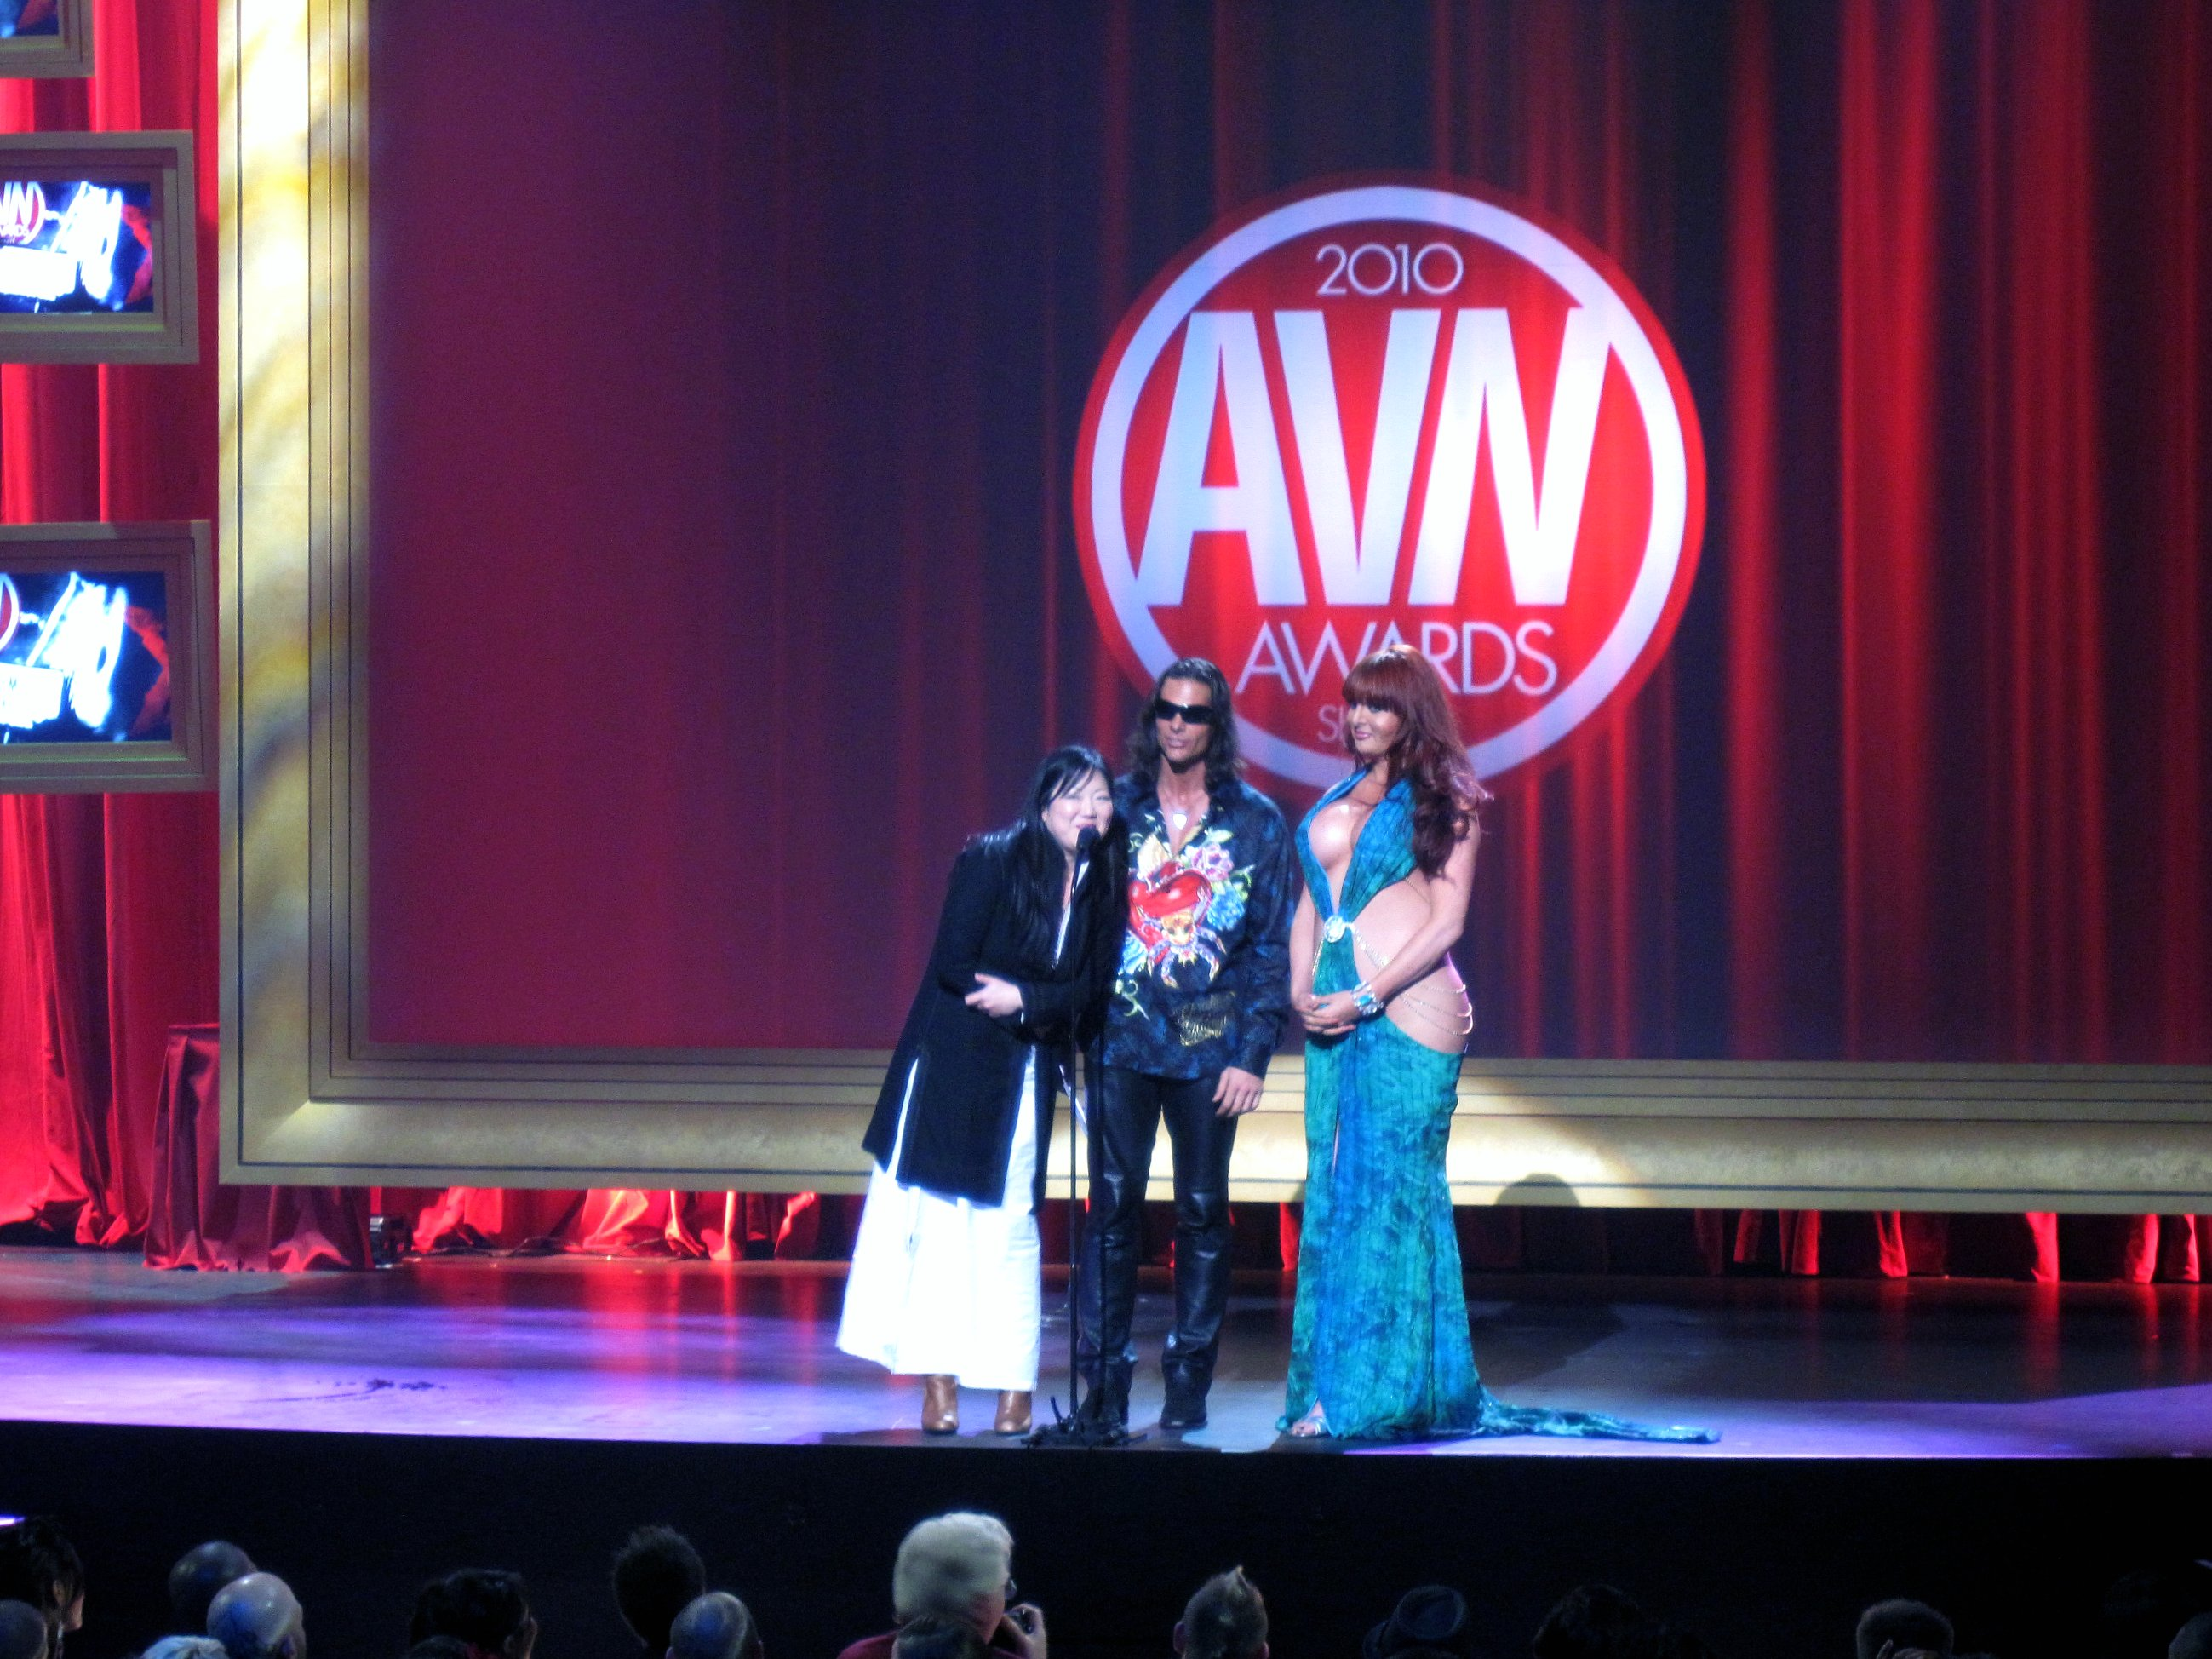 Margaret_Cho,_Nick_Manning,_Wendy_Williams_2010_AVN_Awards_Show_(1)